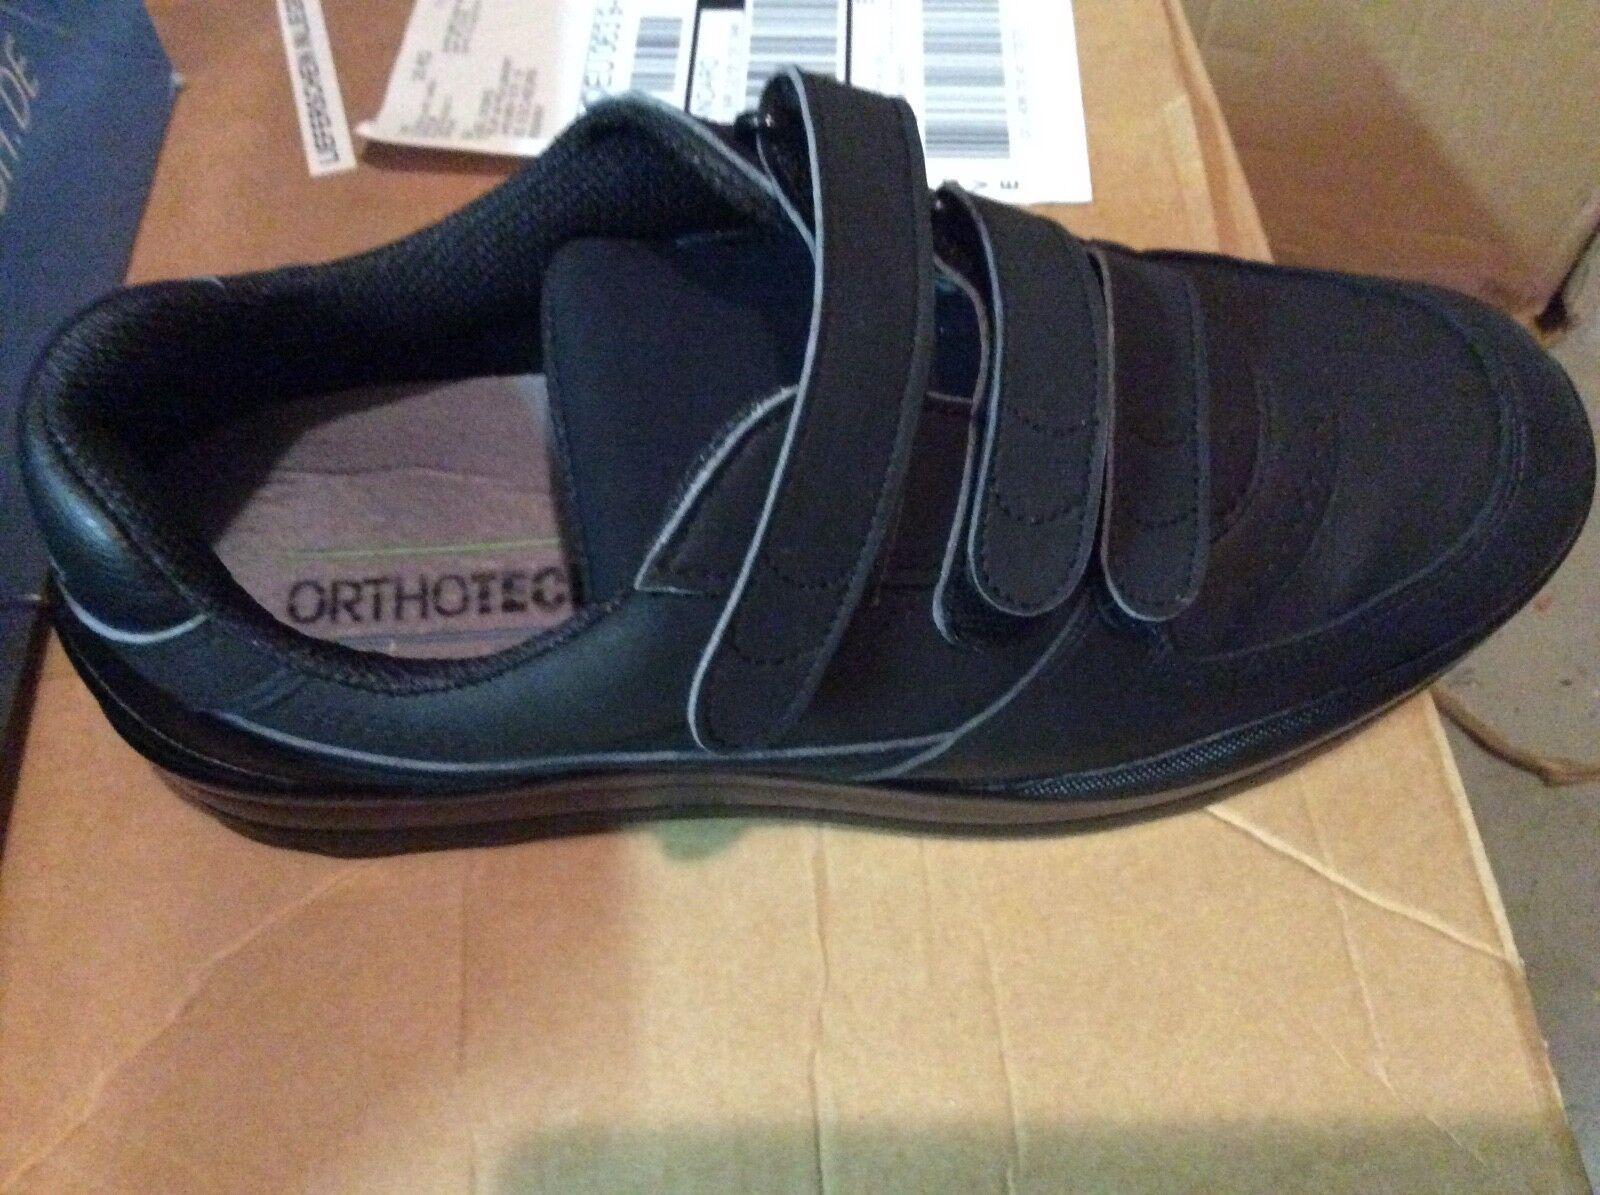 OVP schwarze Orthotech-Halbschuhe Orthotech-Halbschuhe Orthotech-Halbschuhe in Gr.9 34bf80